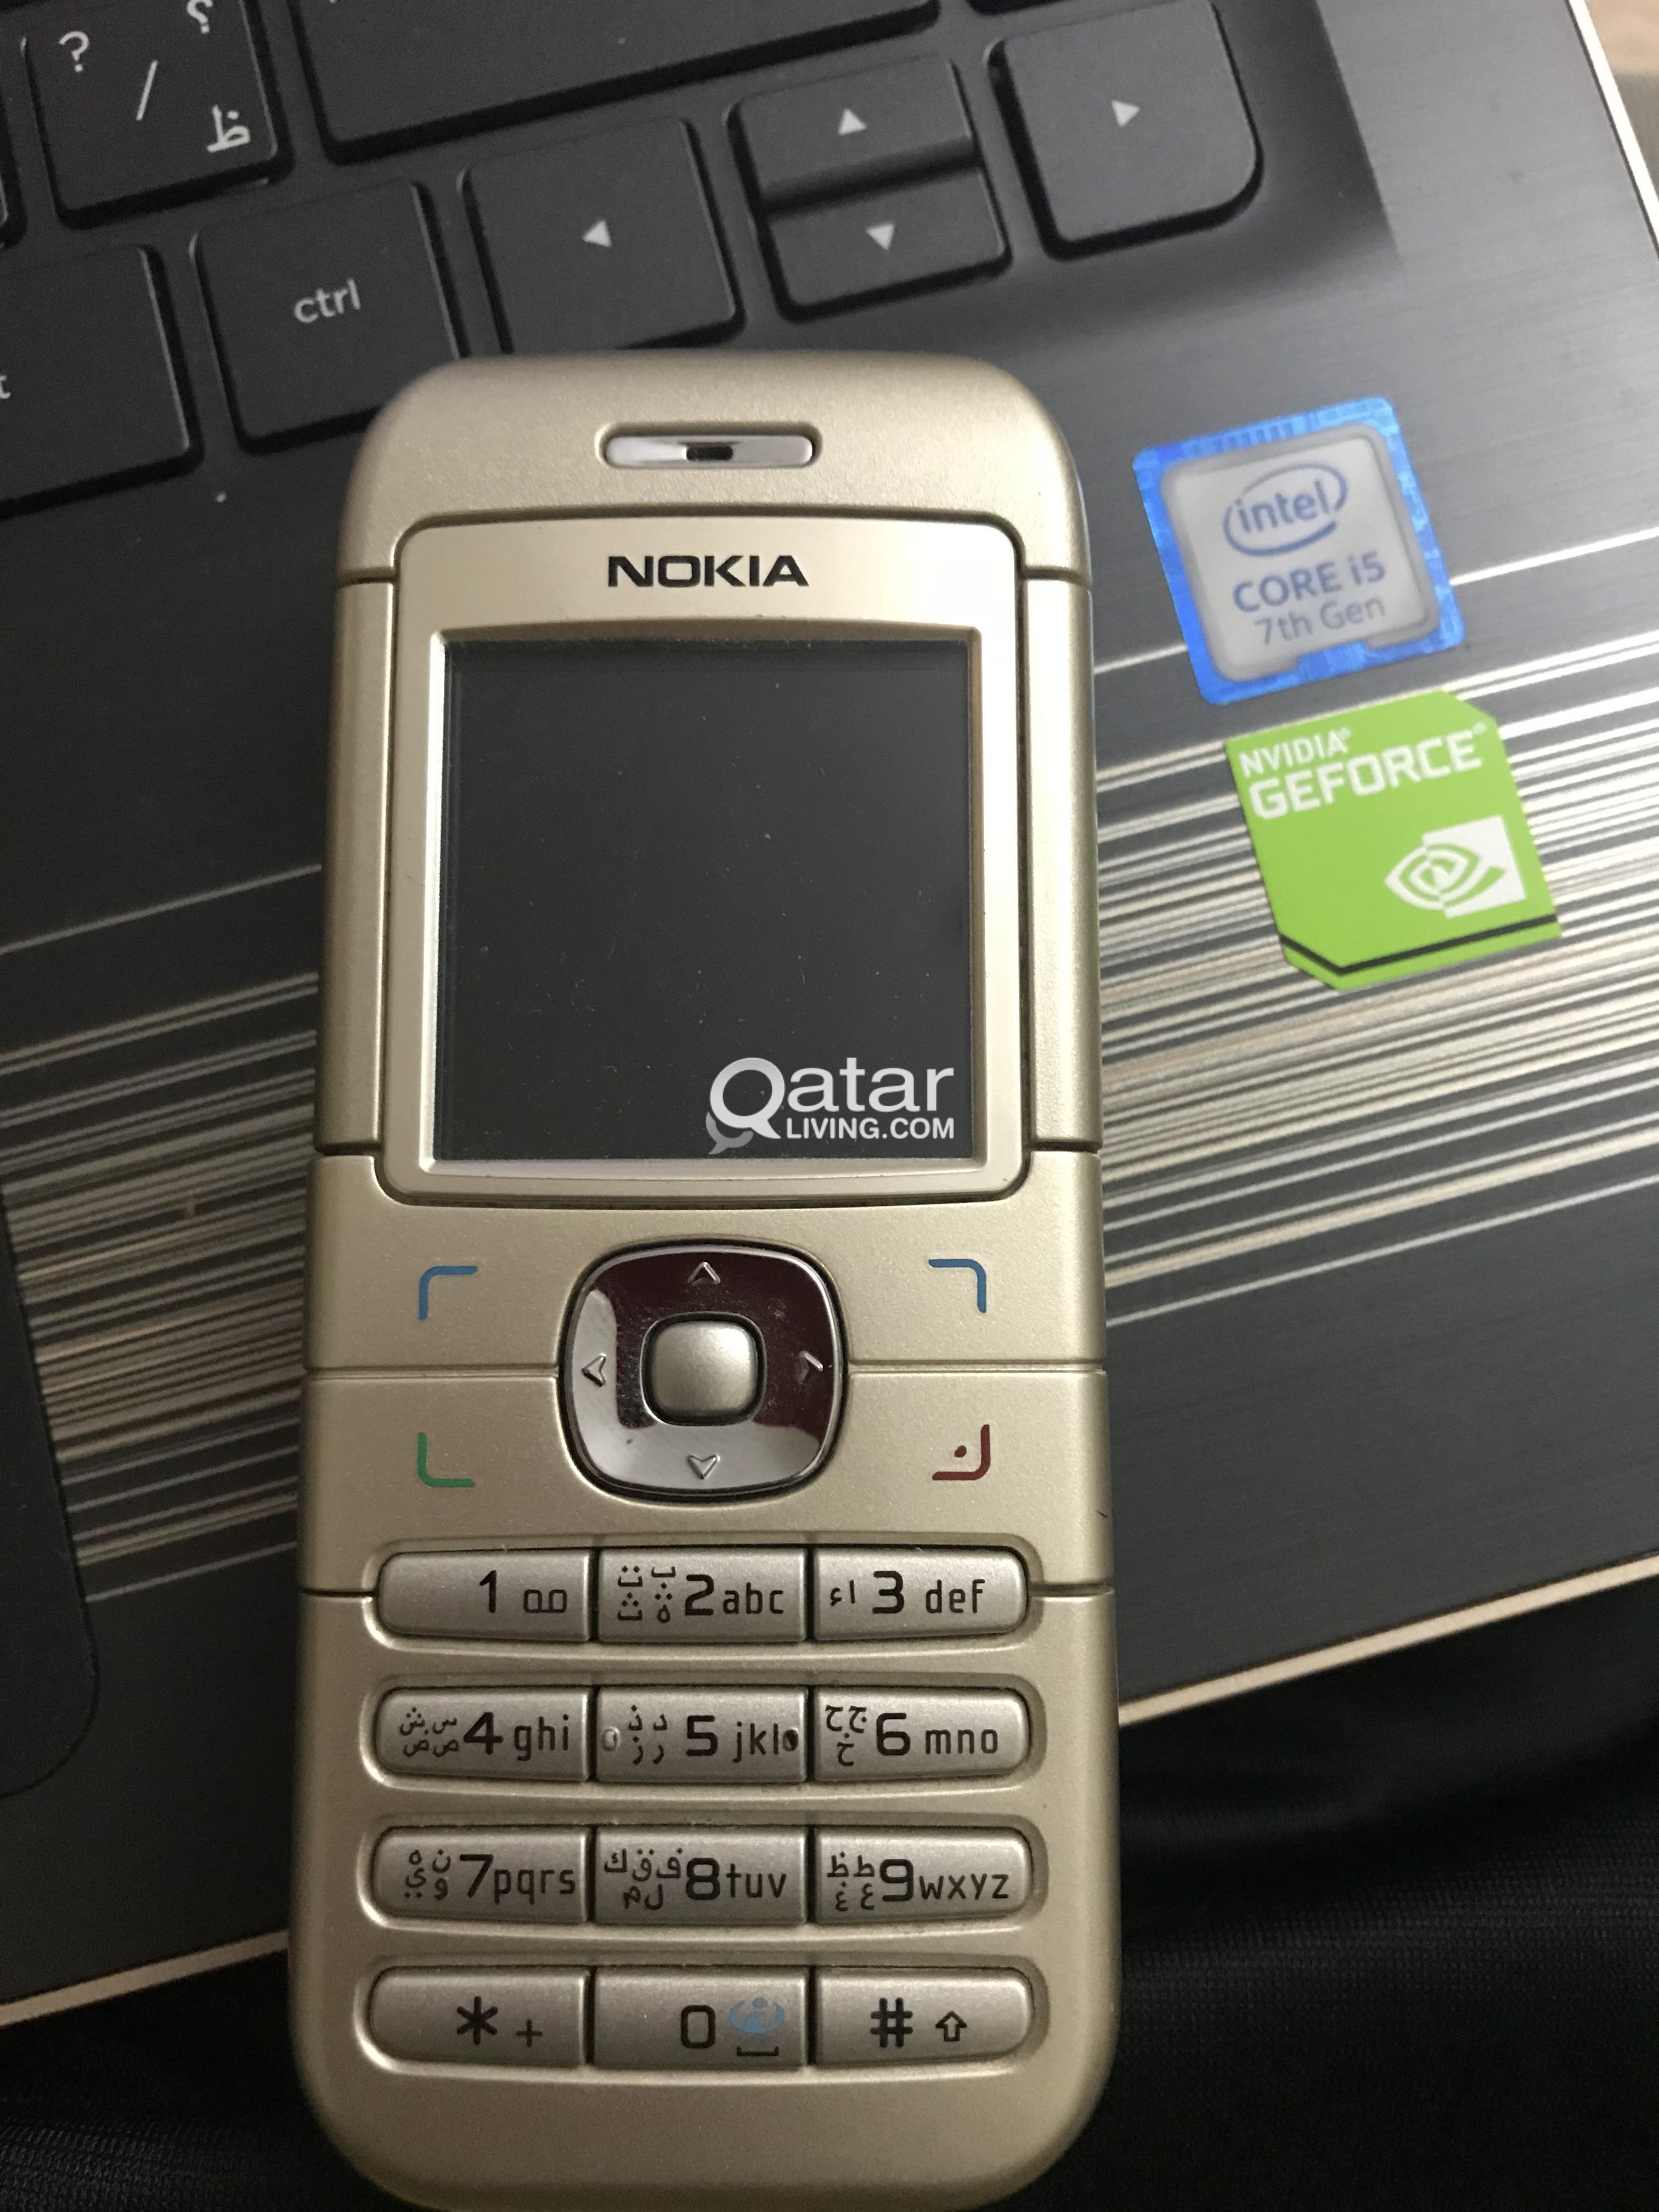 sale Nokia 6030 gold color phone   Qatar Living